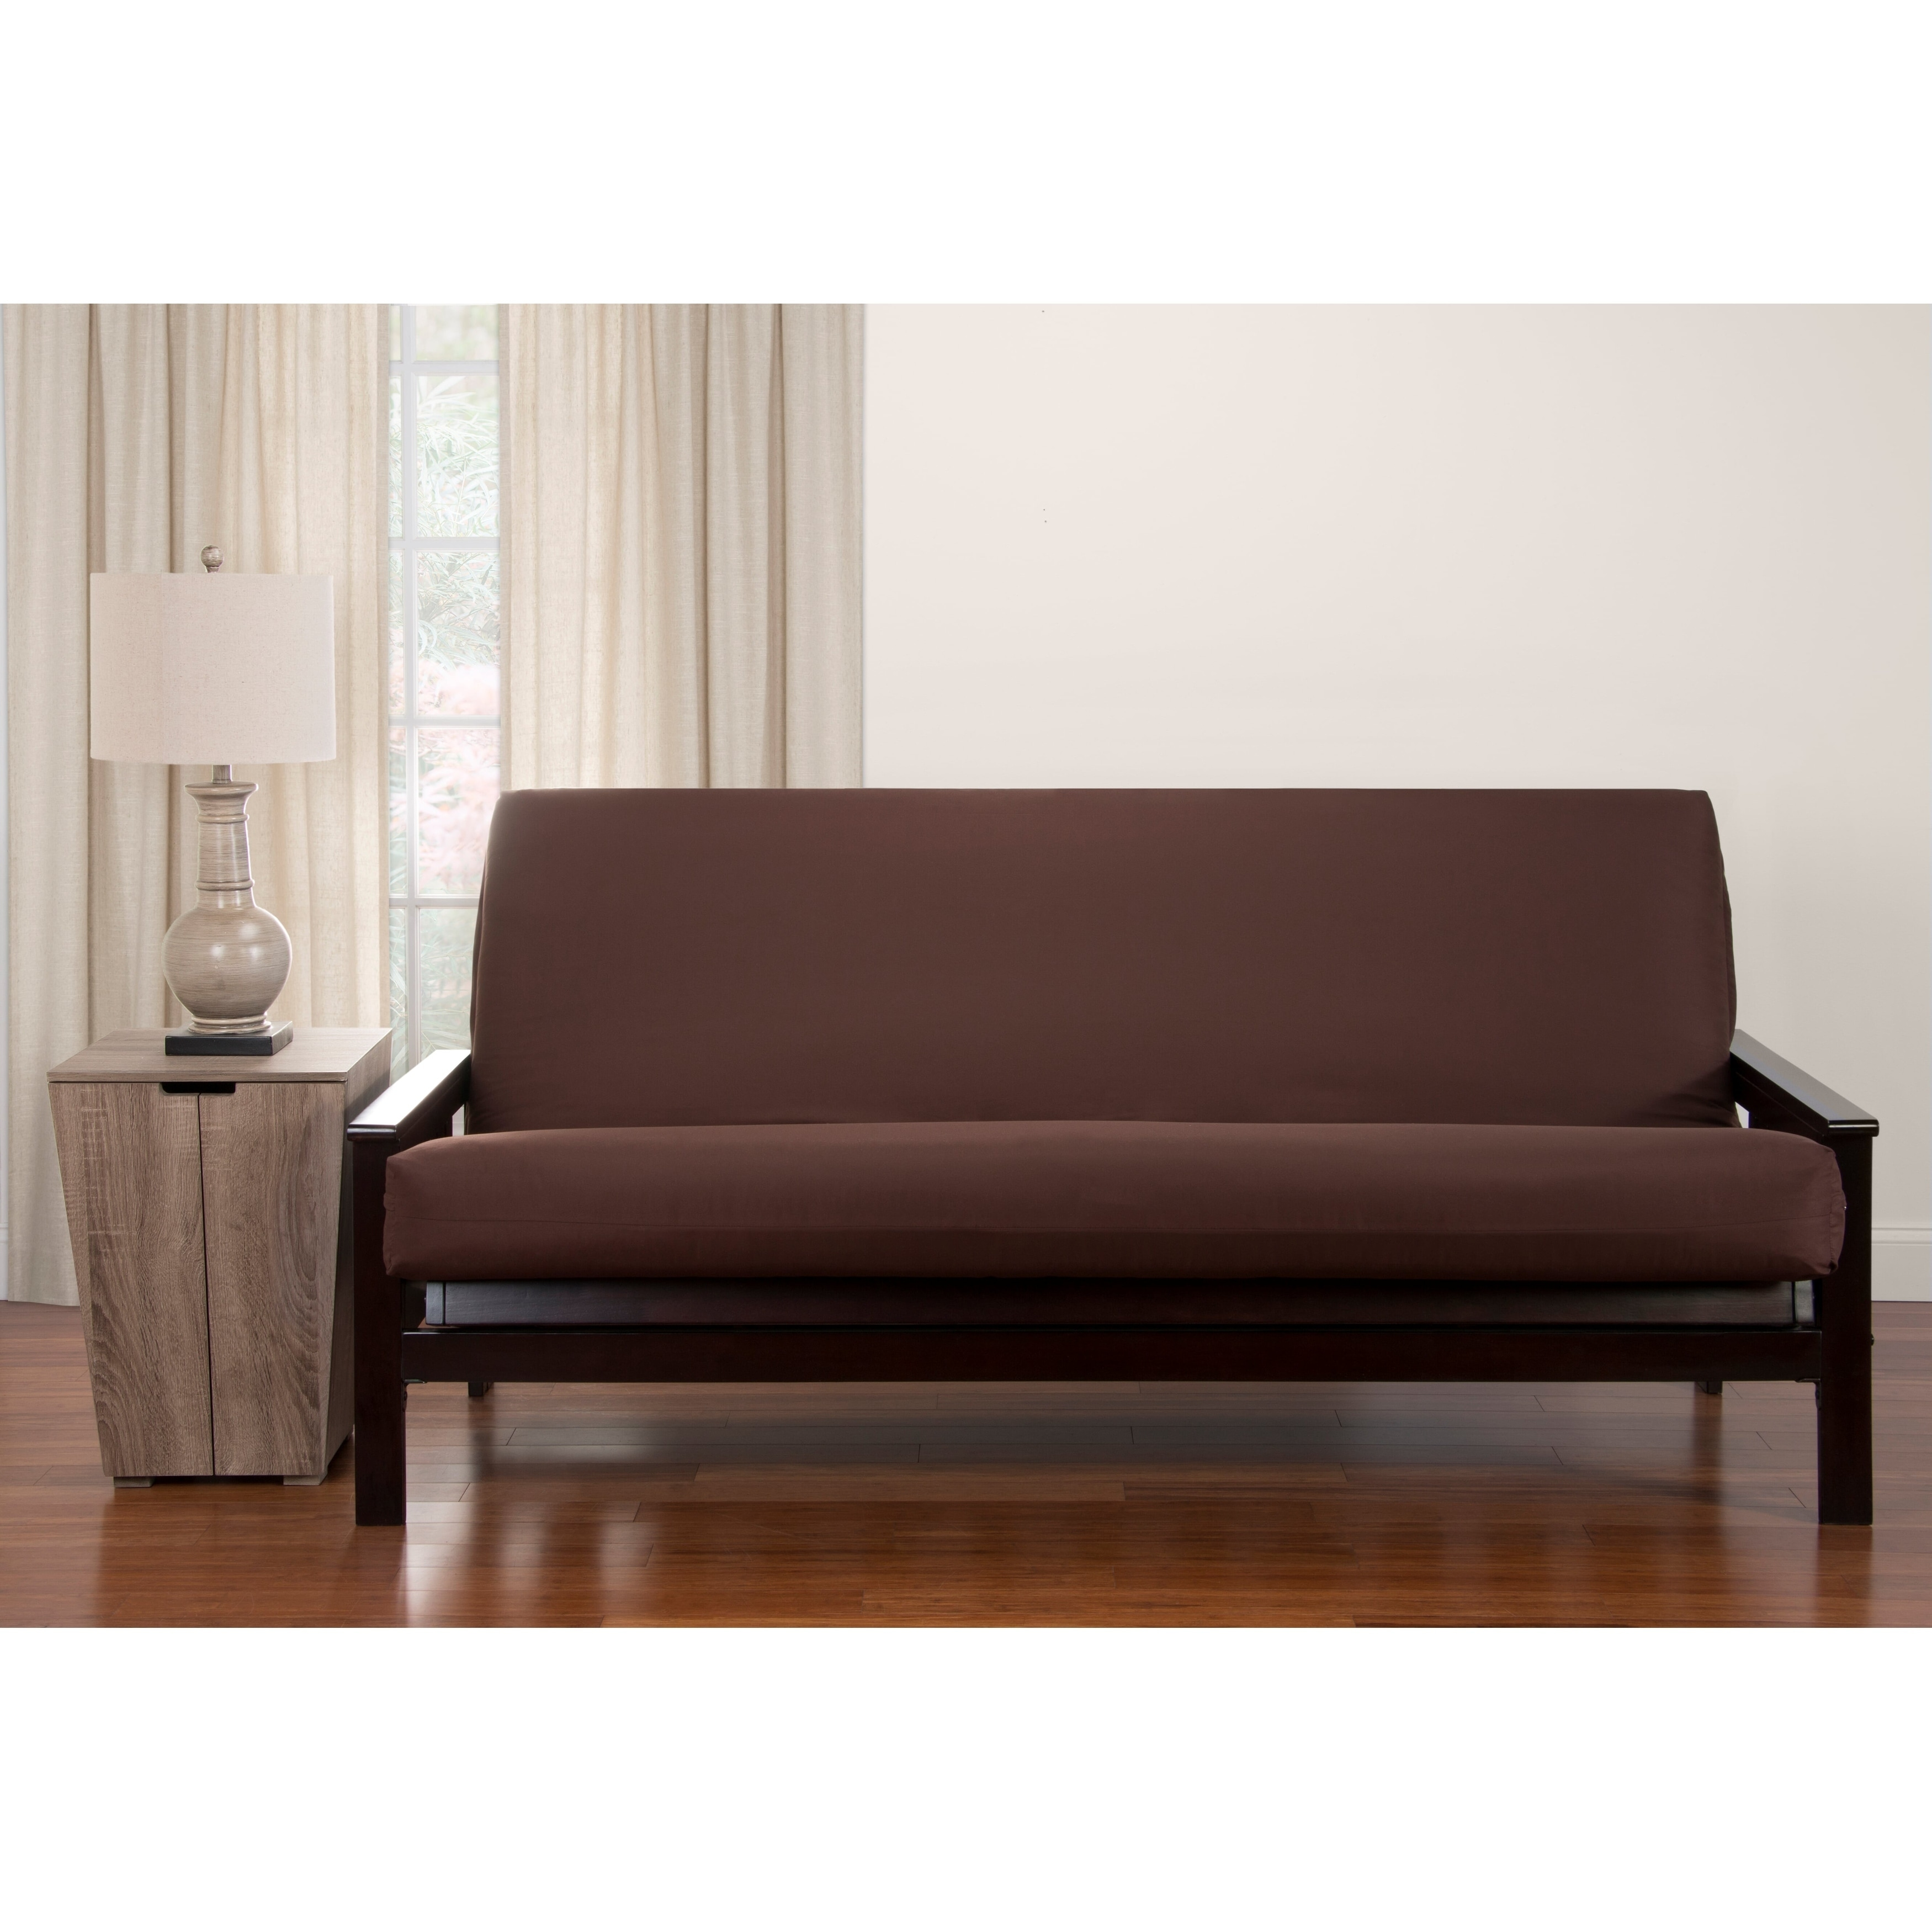 sofa covers london ontario king furniture reviews futon dublin shop